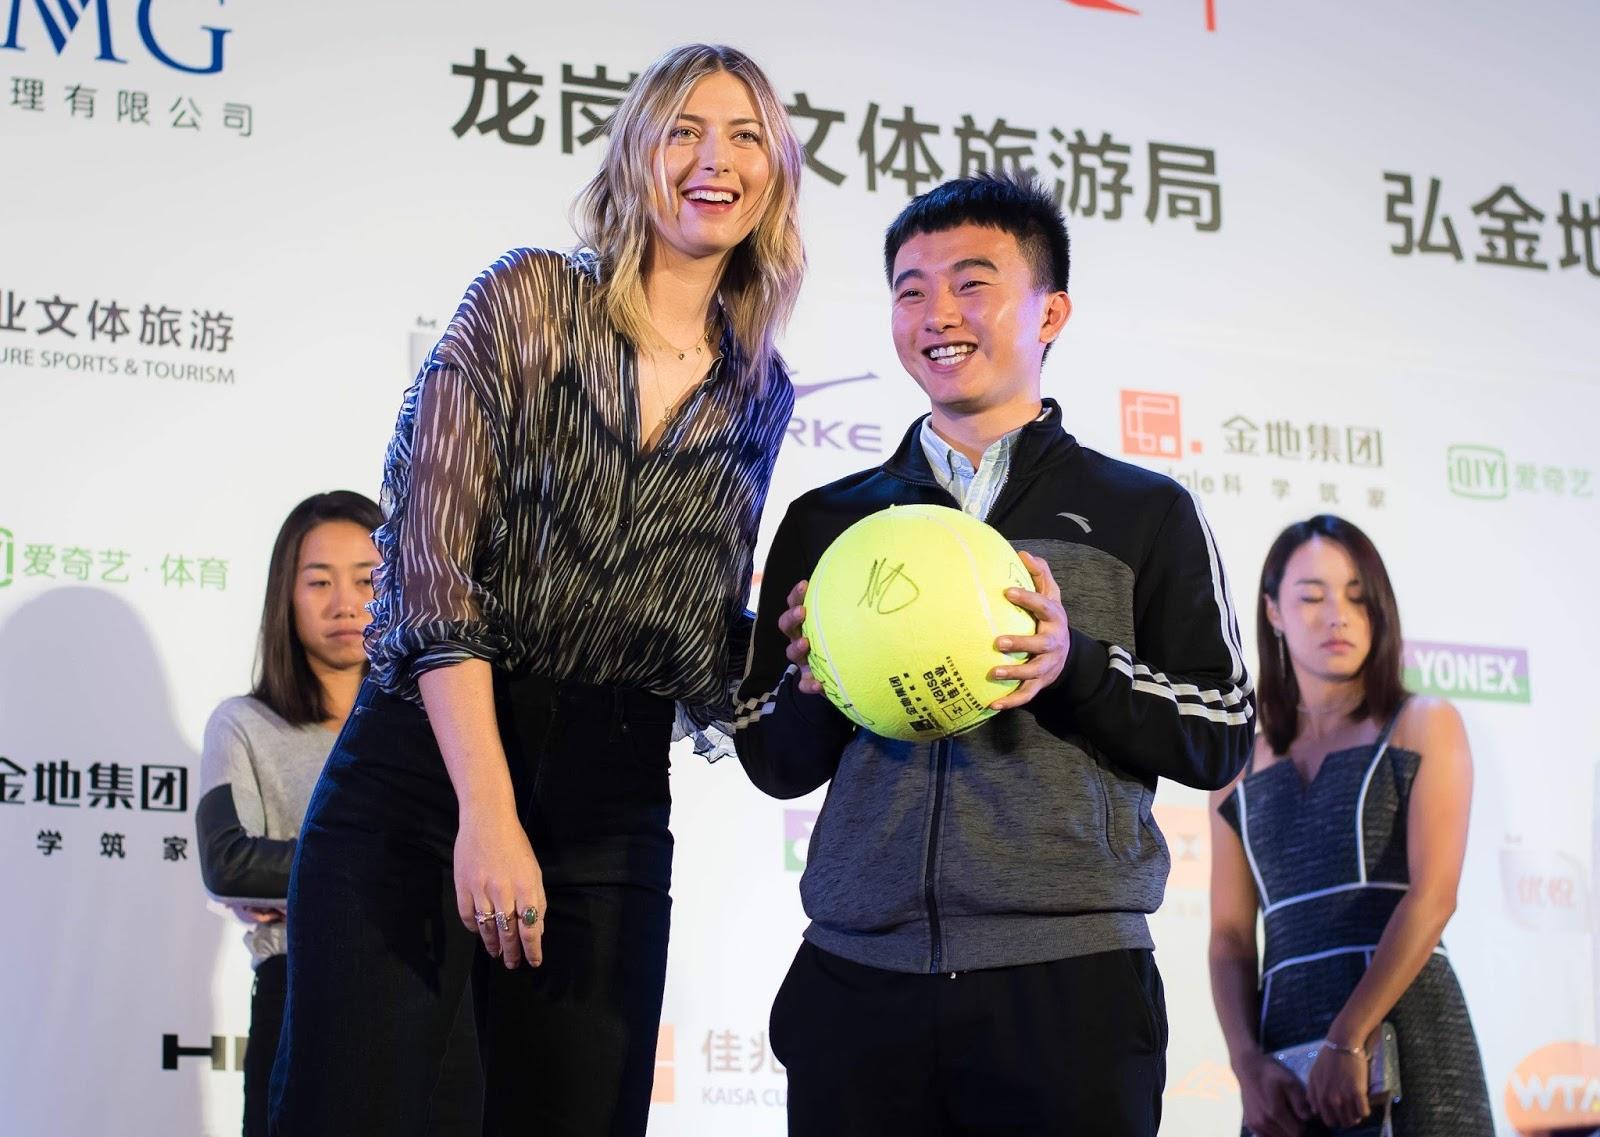 Maria Sharapova at the party of the 2018 Shenzhen Open